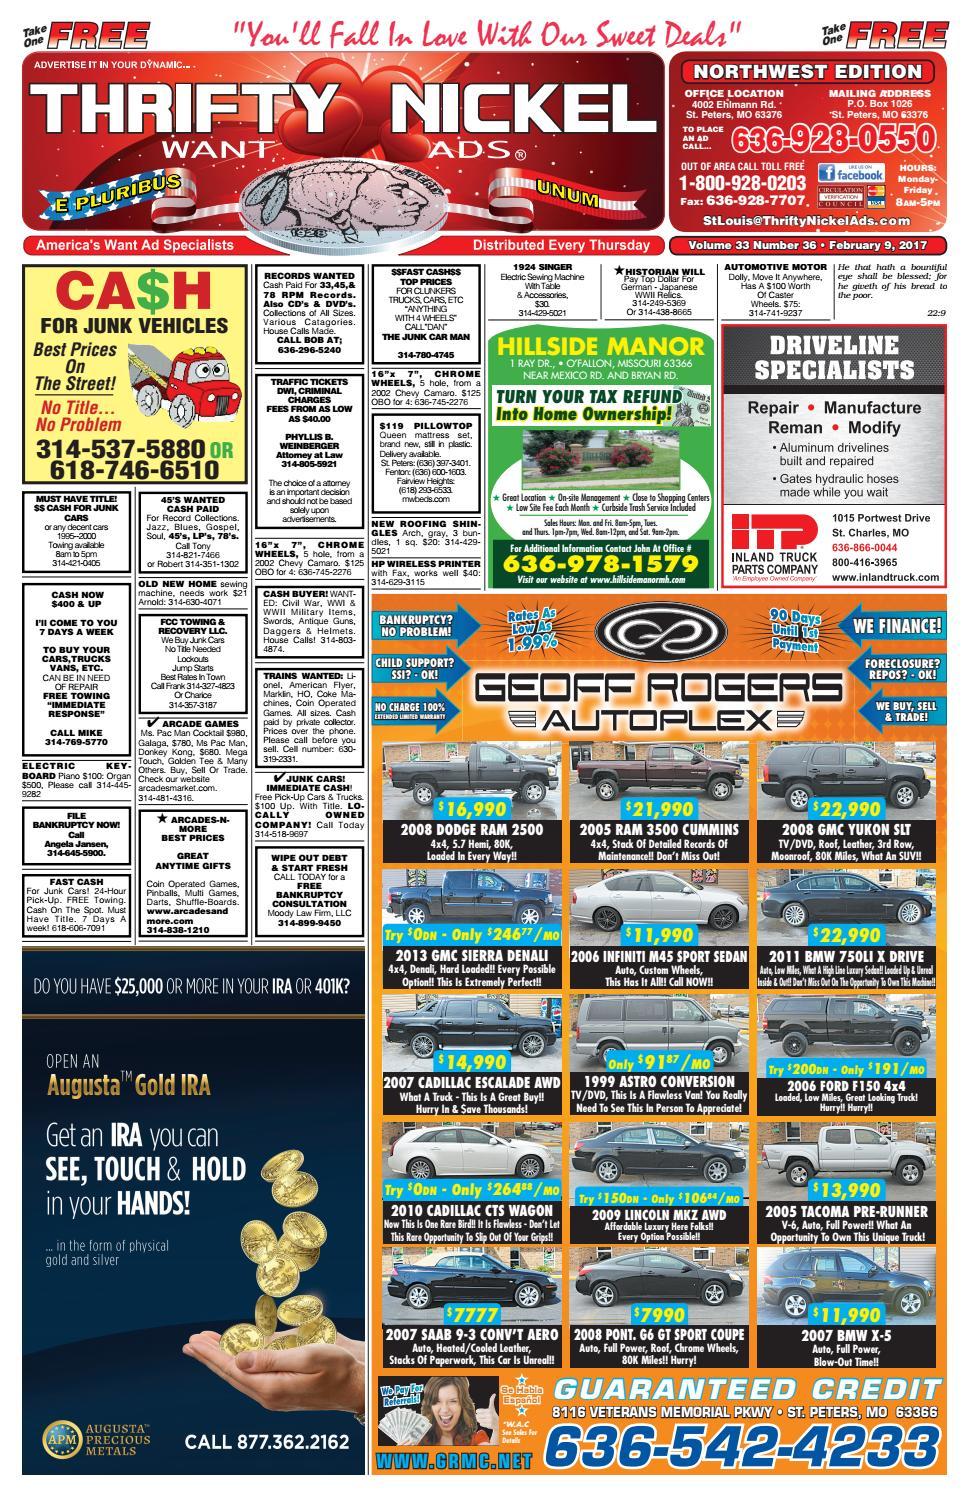 Faxless online cash advance photo 4